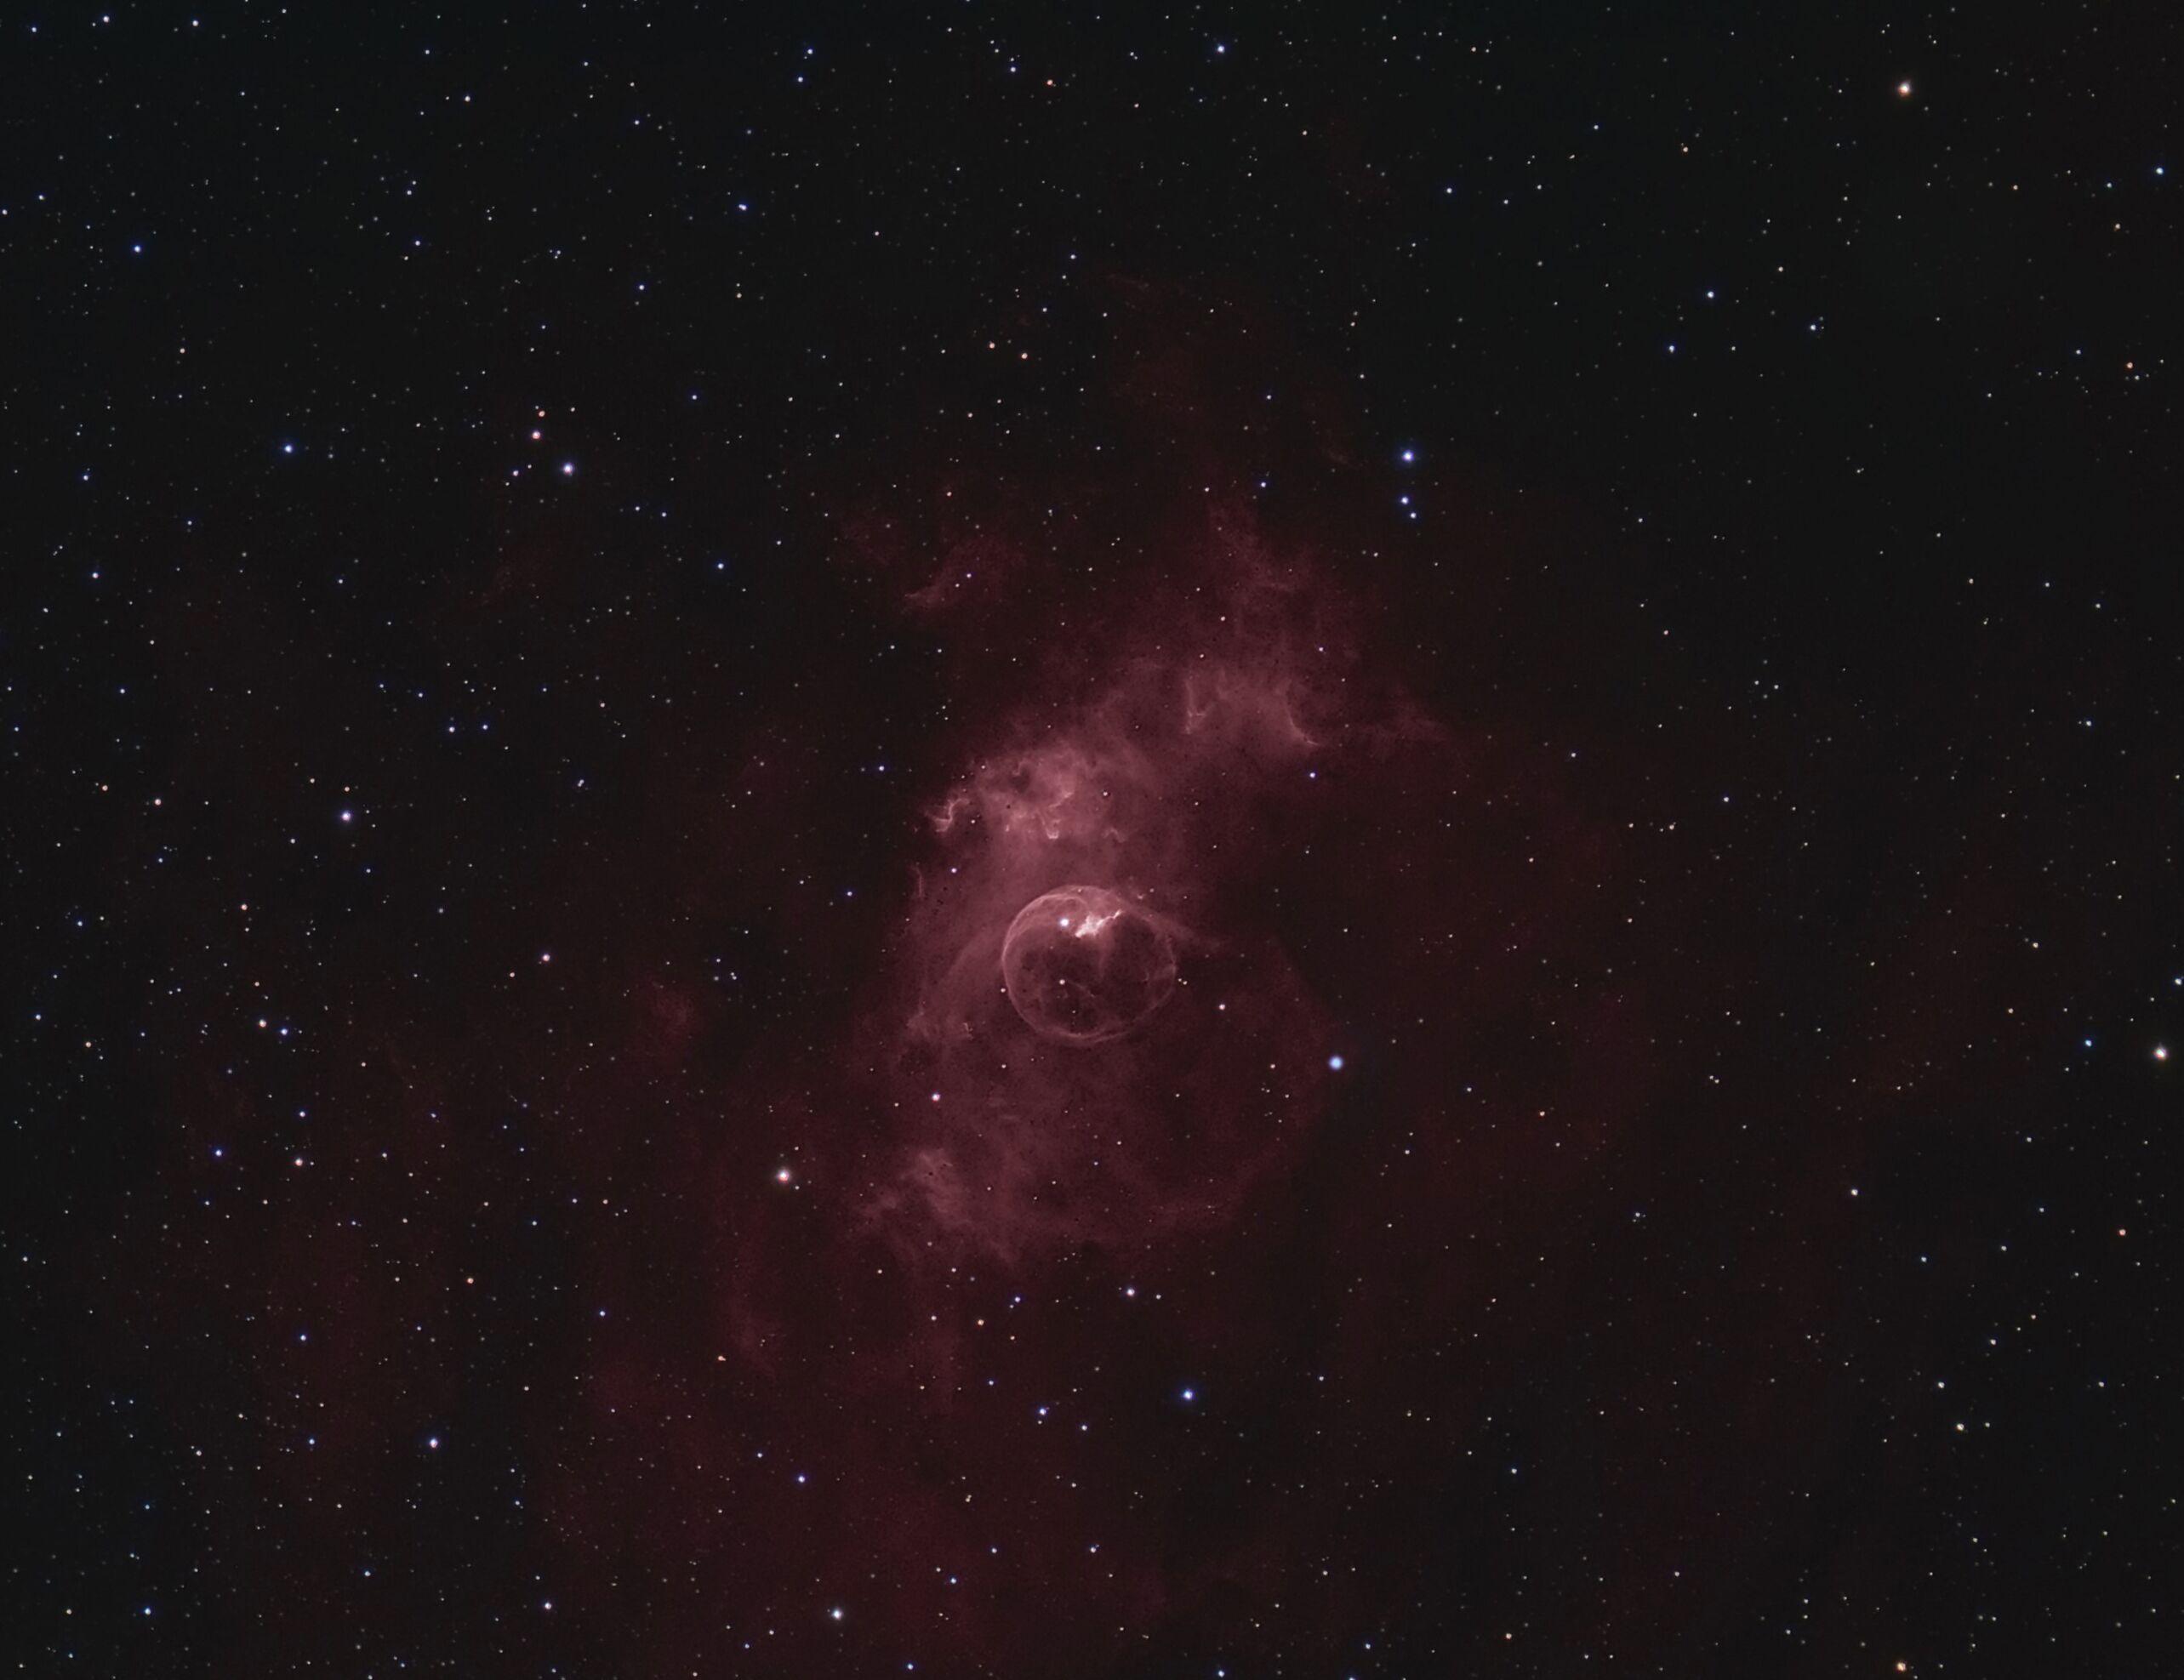 Dennis Wilde NGC7635 Bubble Nebula